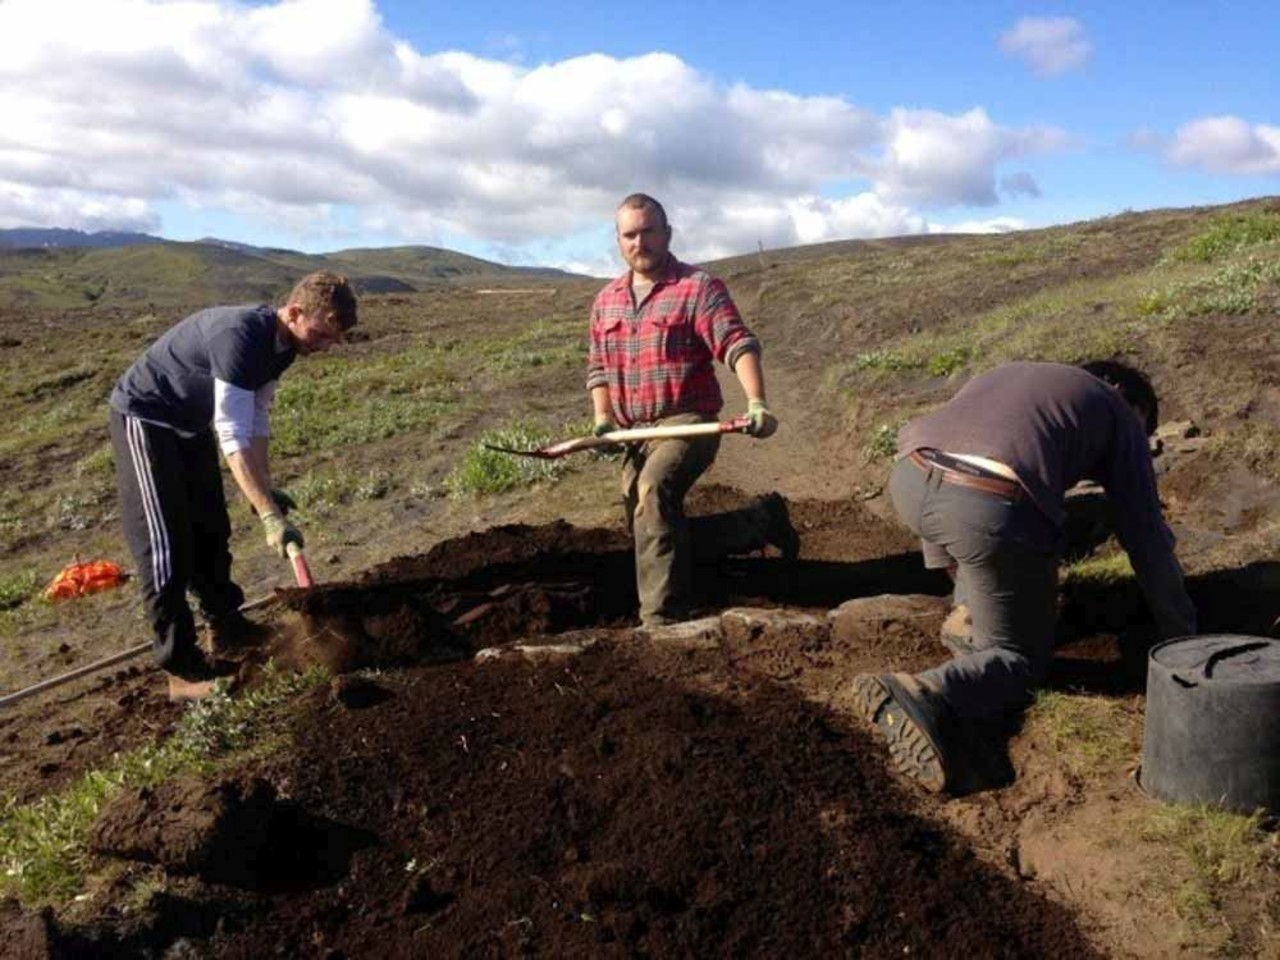 Three men working hard on digging in Iceland